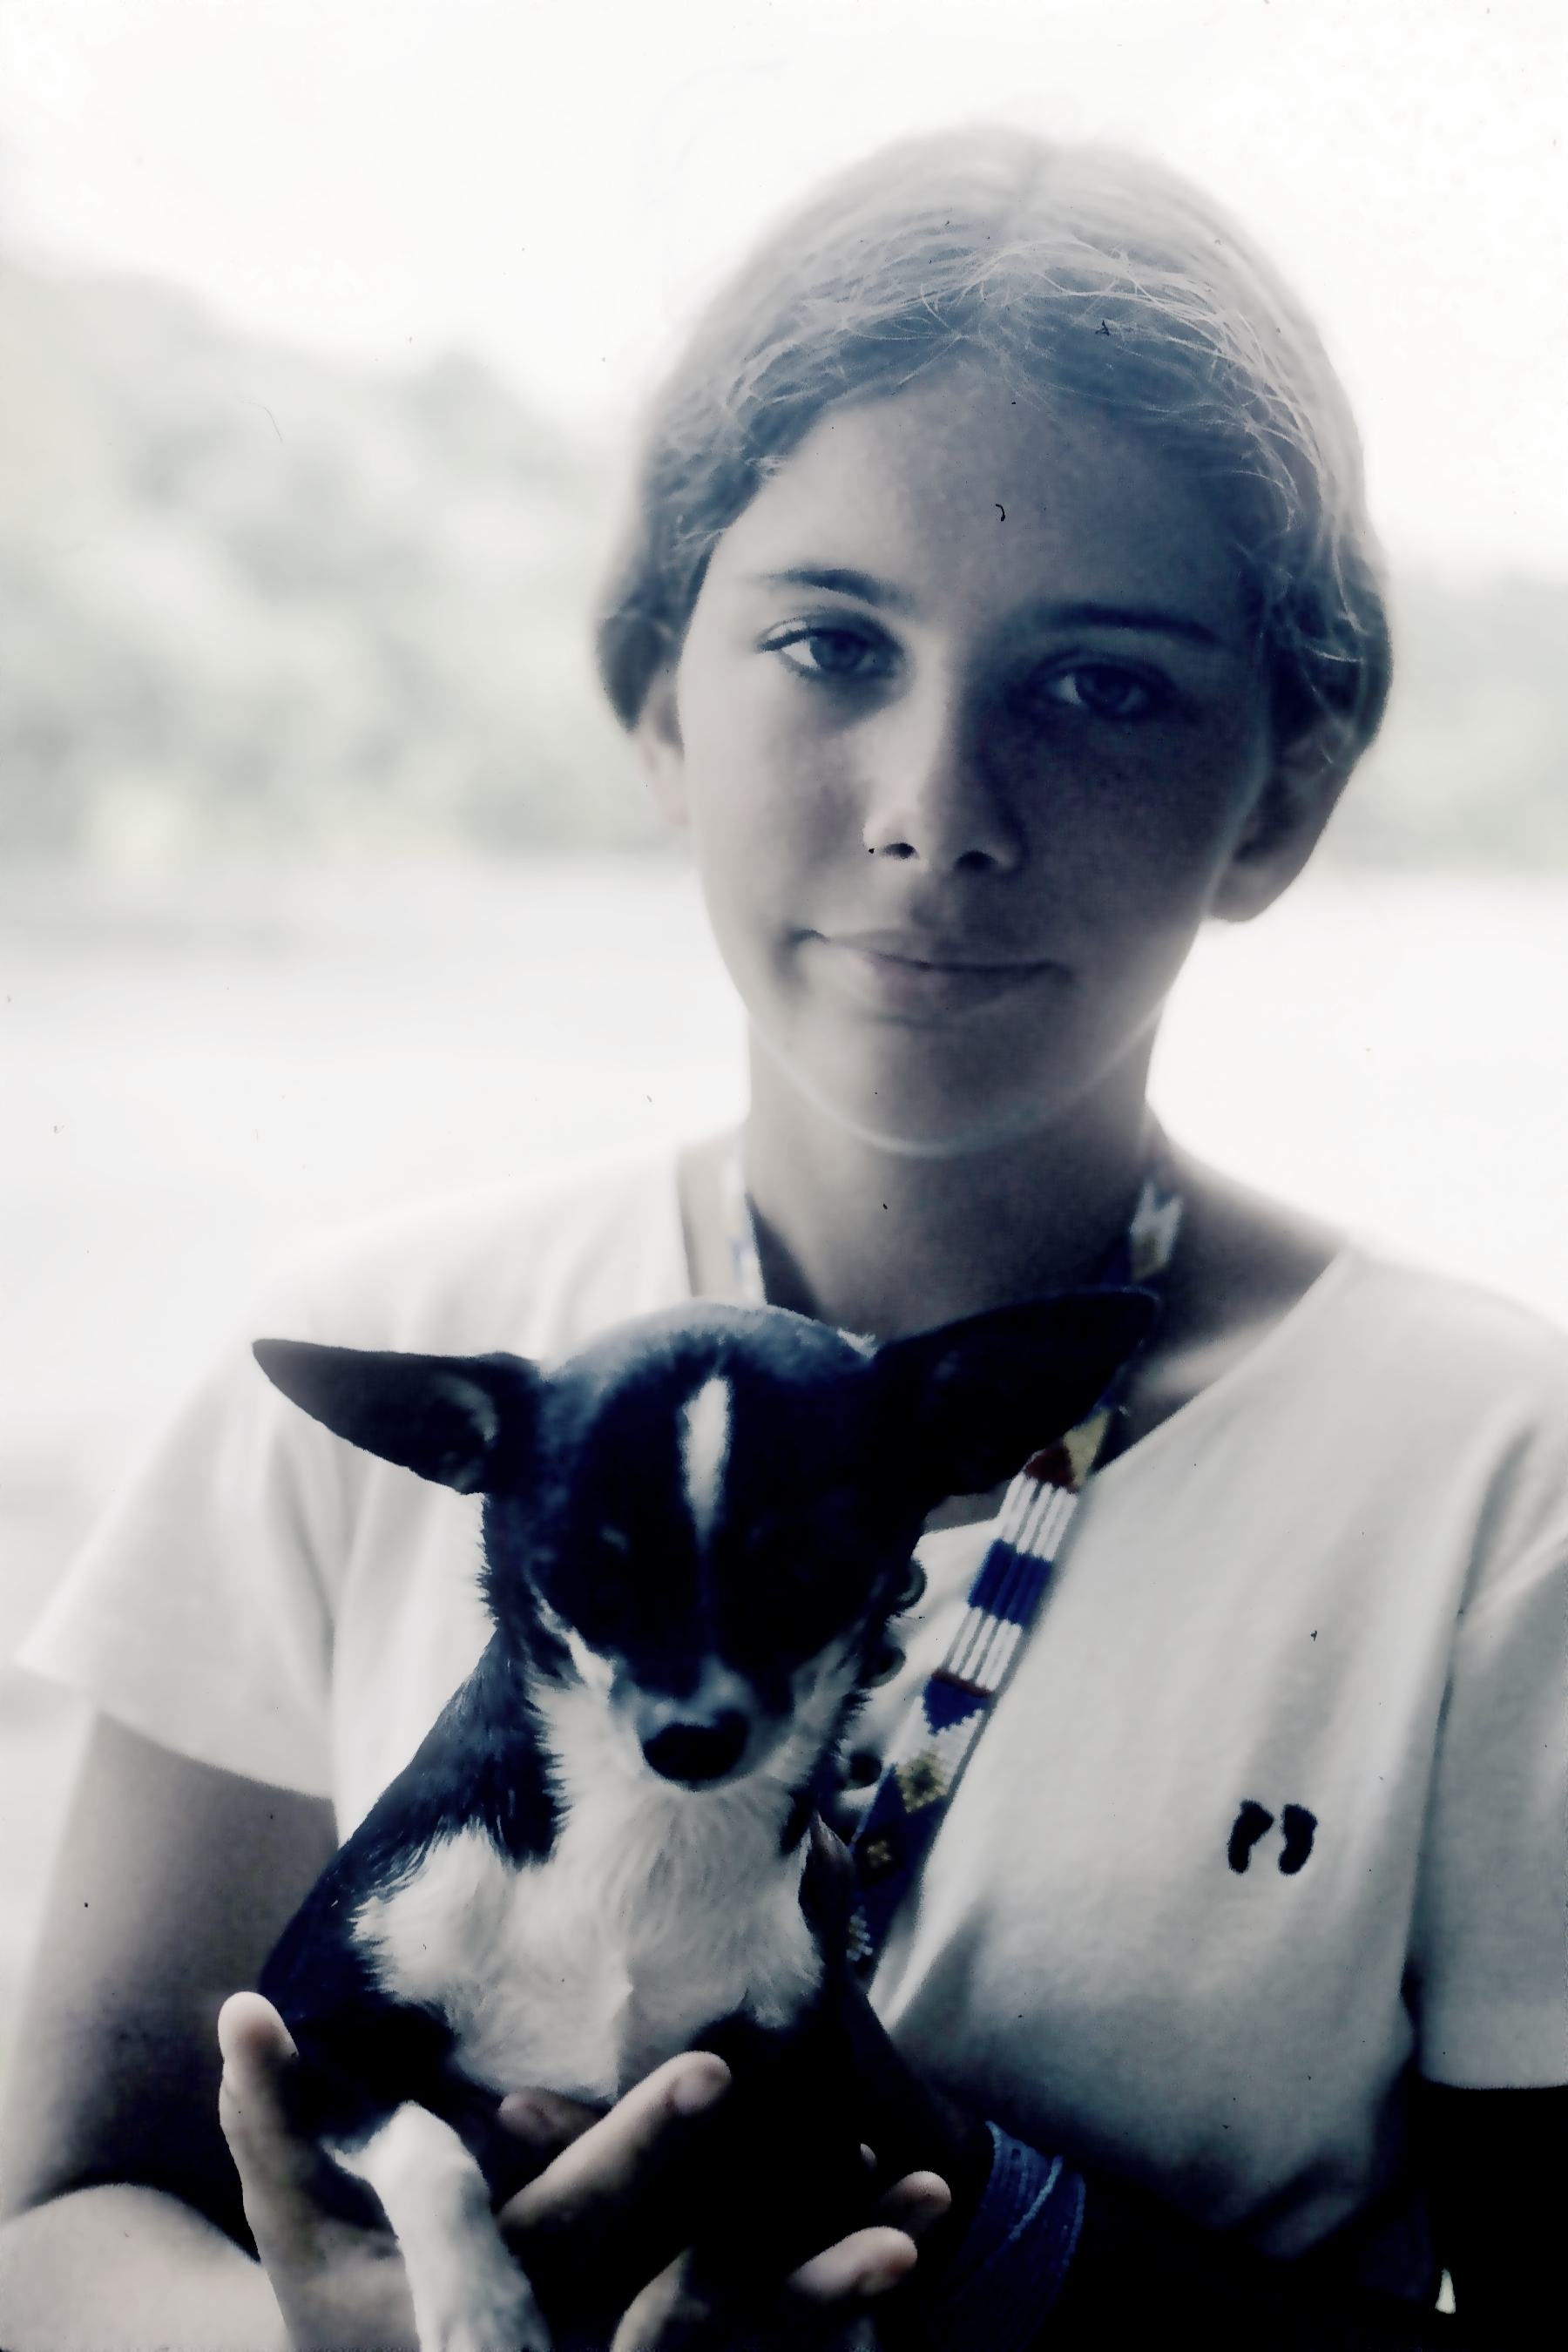 Ruth & Mopili | Suriname | 1973